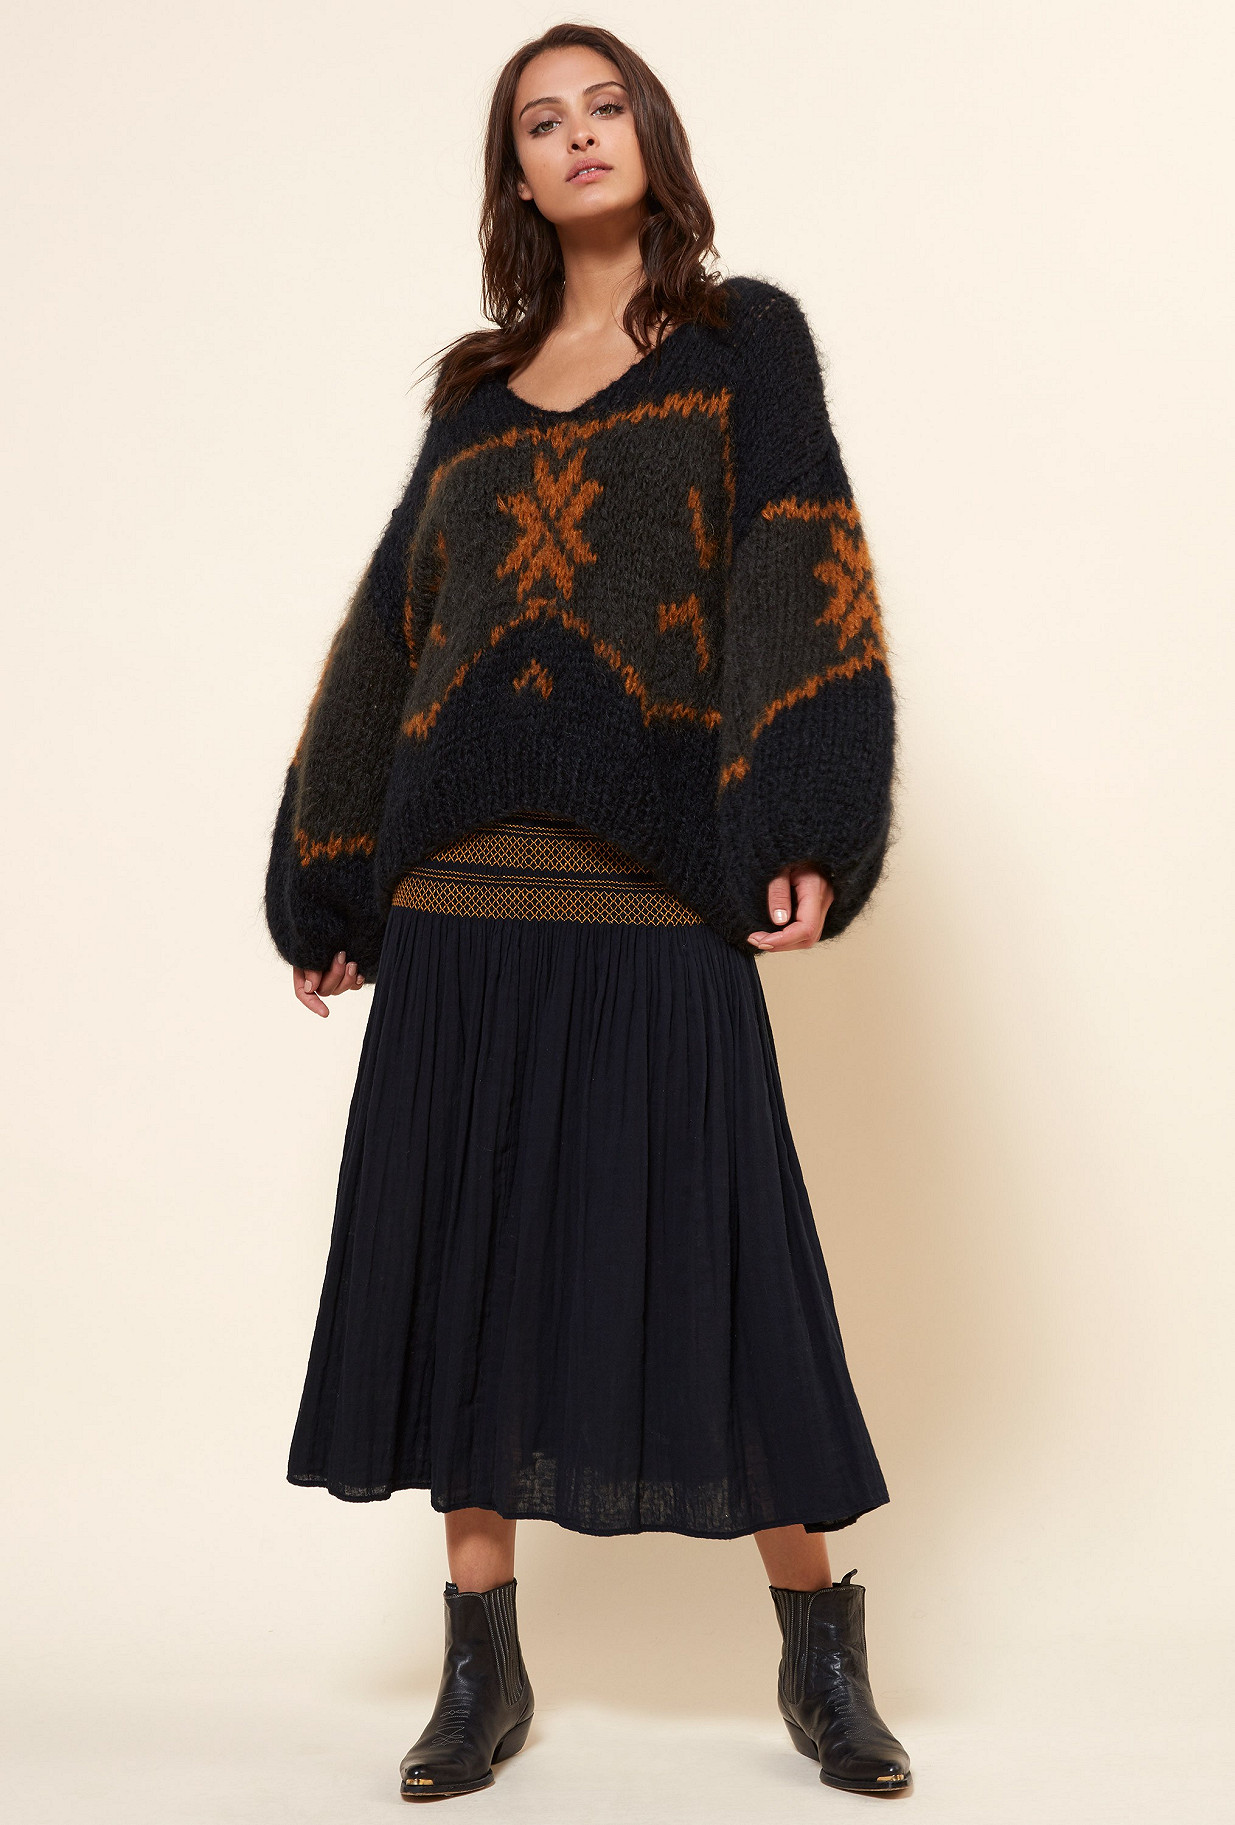 Paris clothes store Sweater  Sigmund french designer fashion Paris